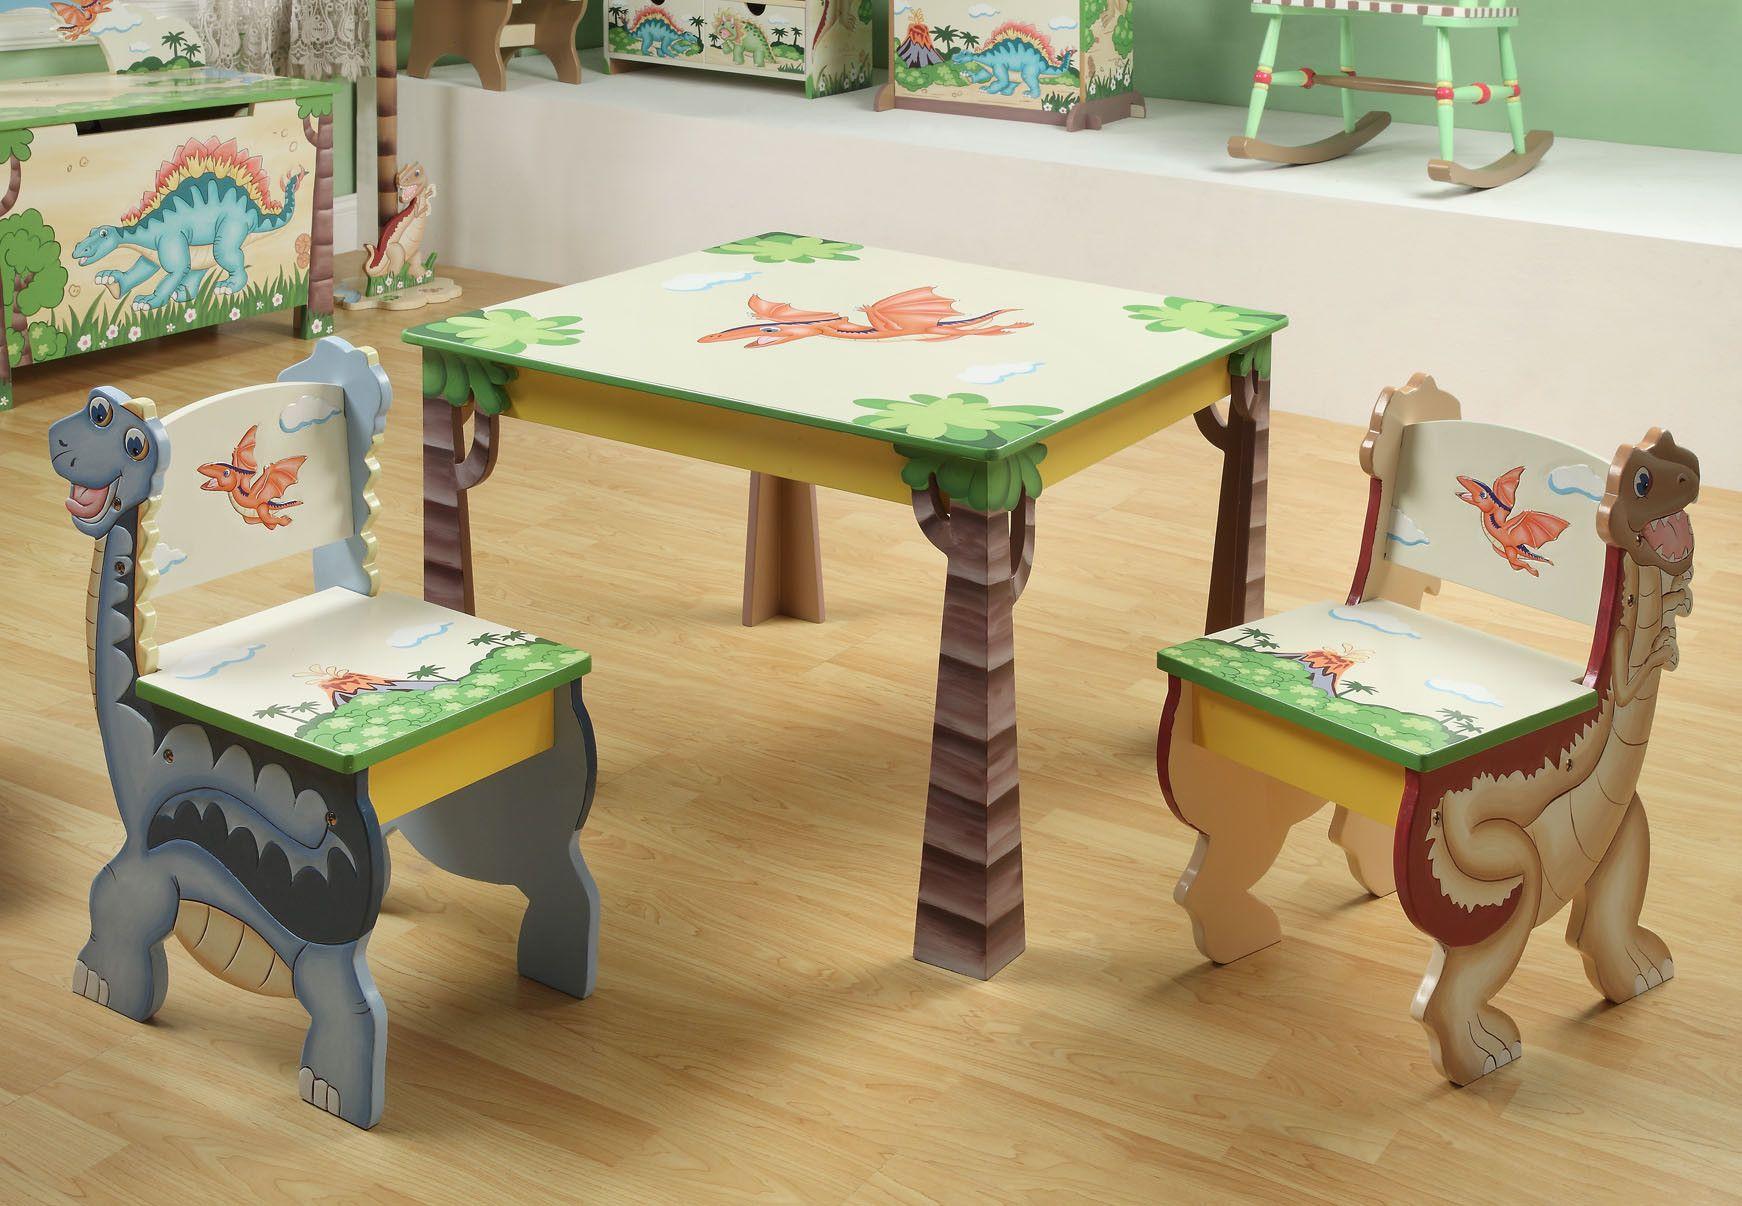 Teamson Kids Dinosaur Kingdom Childrens 3 Piece Table and Chair Set